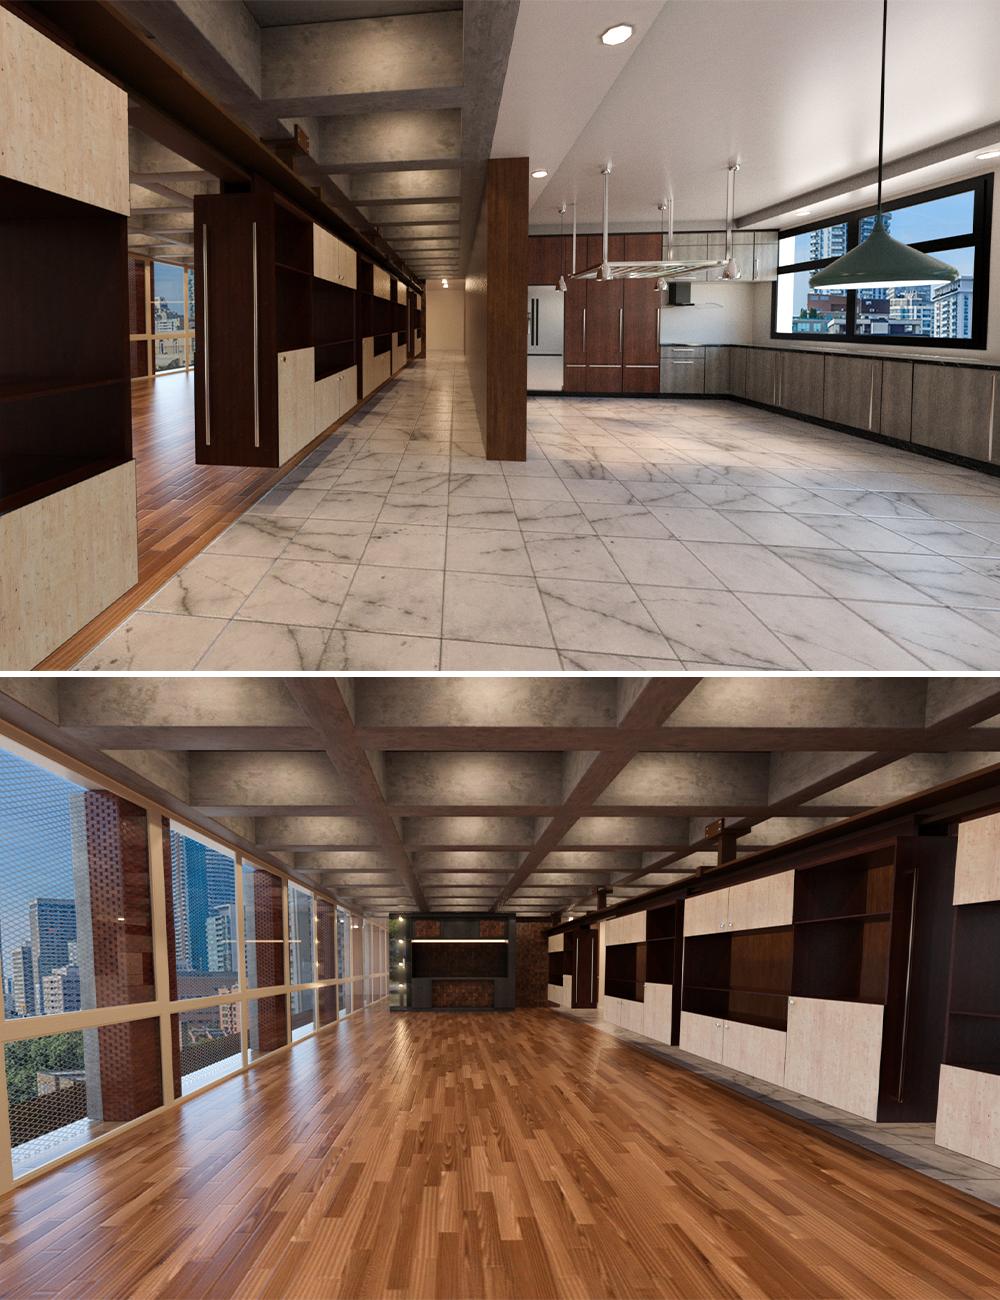 Tesla3dcorp Open Apartment Environment by: Tesla3dCorp, 3D Models by Daz 3D